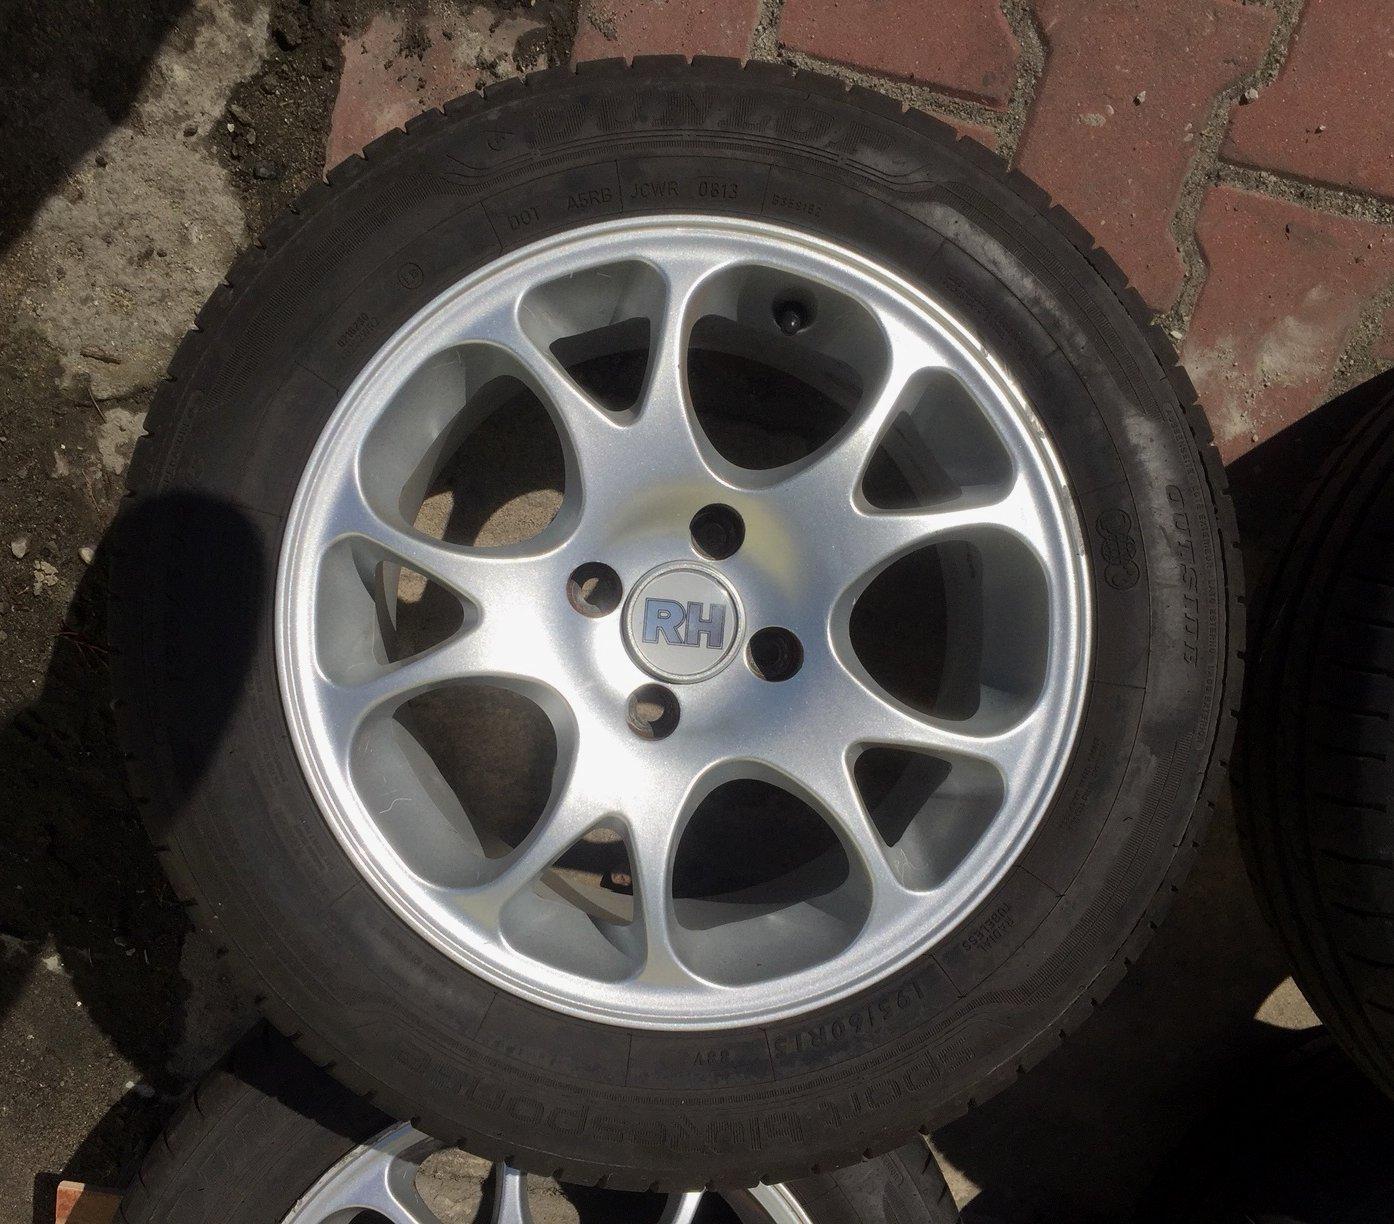 Felgi Aluminiowe Rh Opony 15 Honda Civic Vii 7286247213